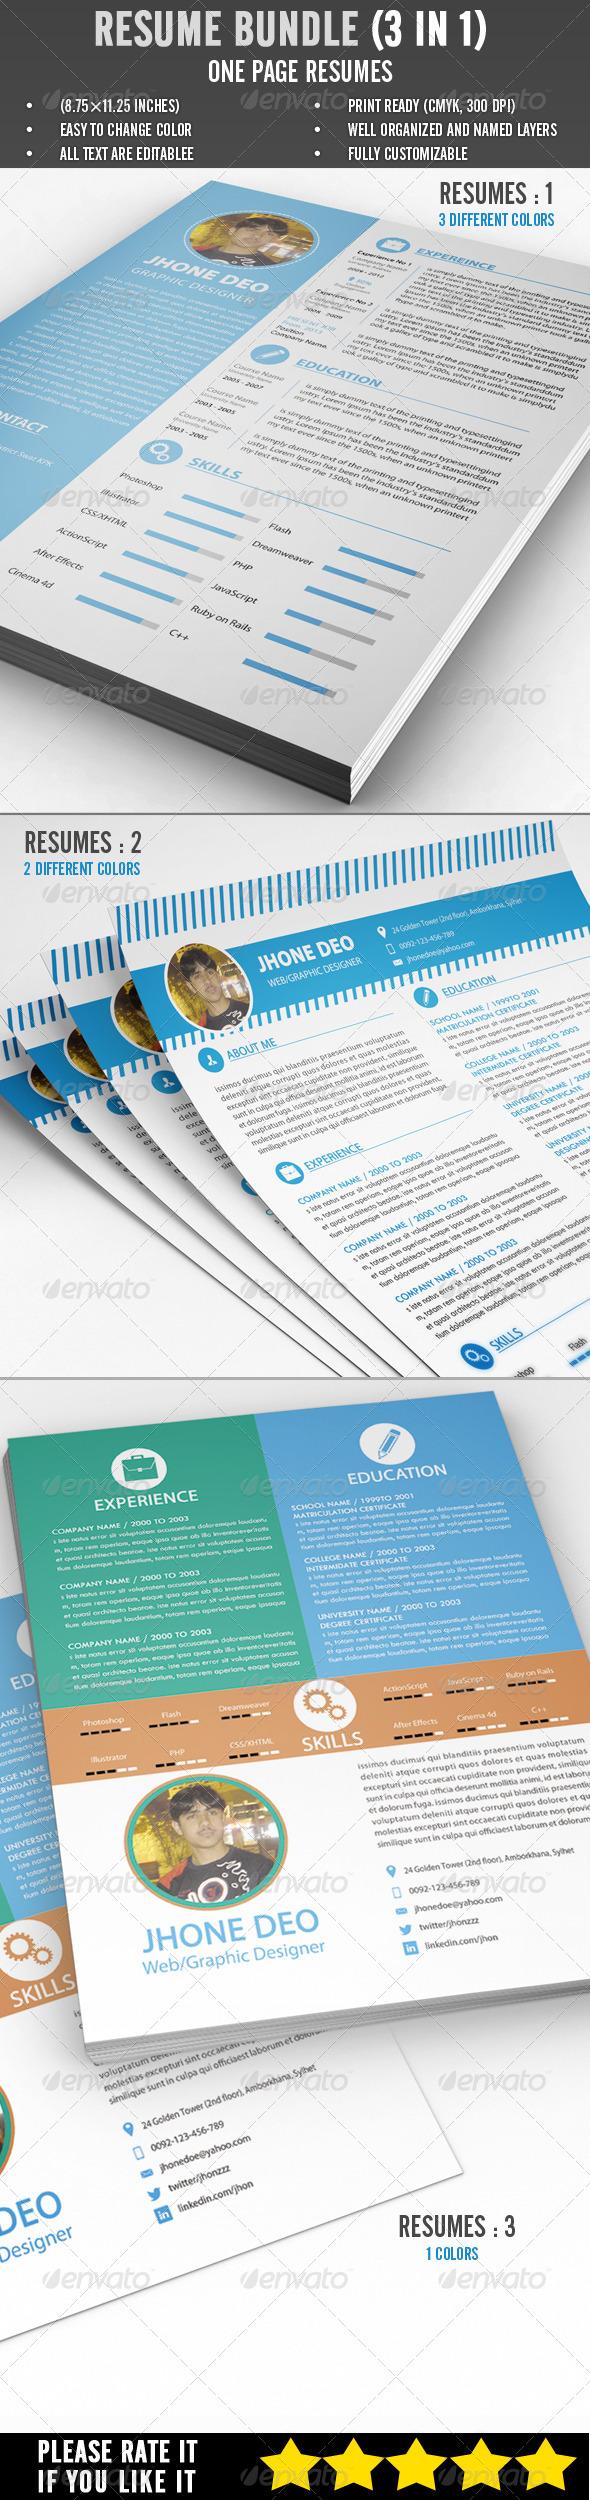 GraphicRiver Resume Bundle 3 in 1 6848302